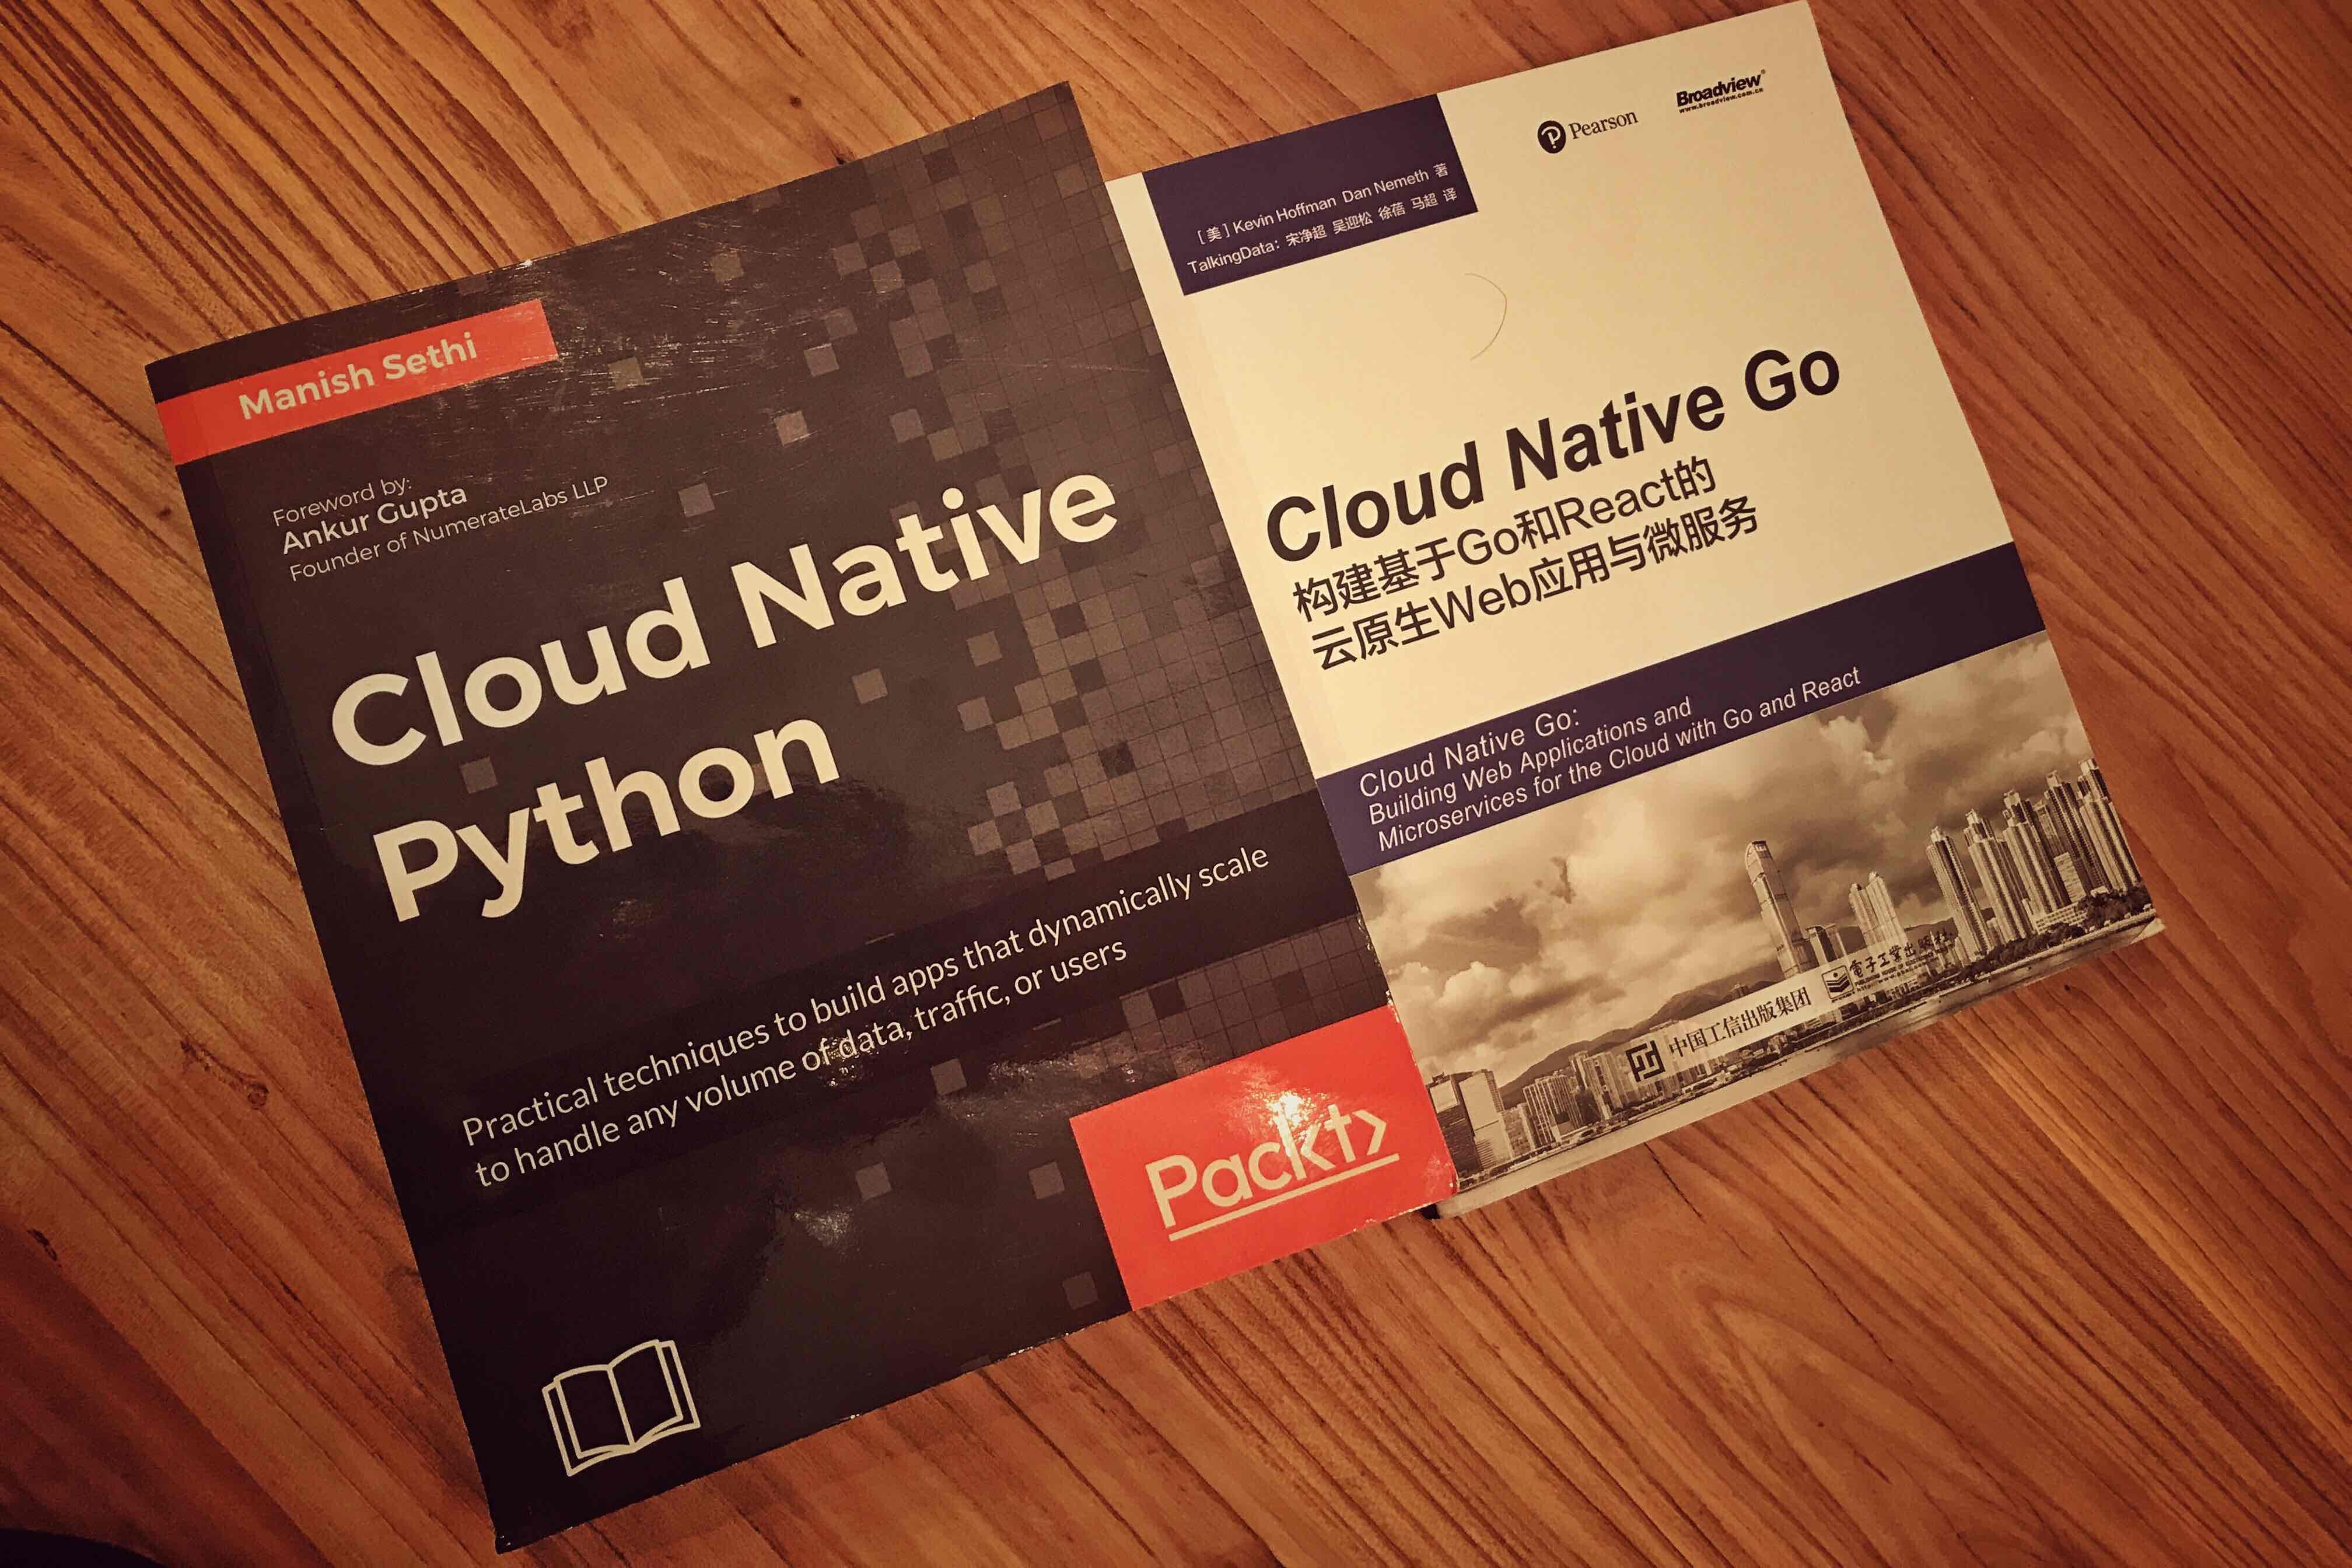 Cloud Native Python 和 Cloud Native Go 合影